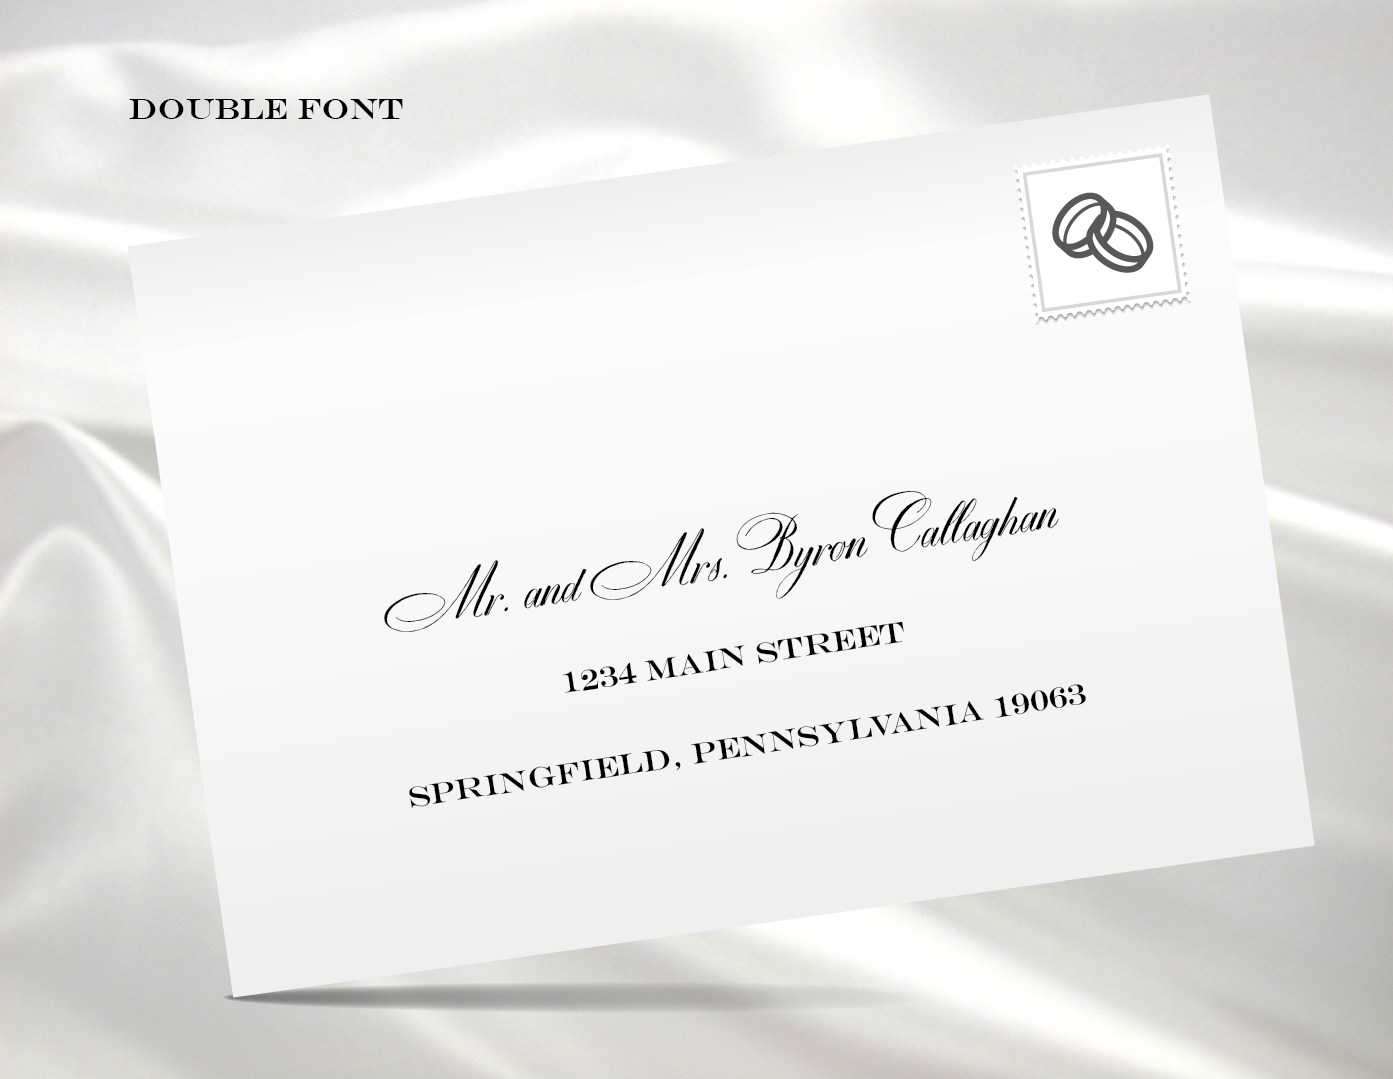 FIC_envelope_samples-07.png